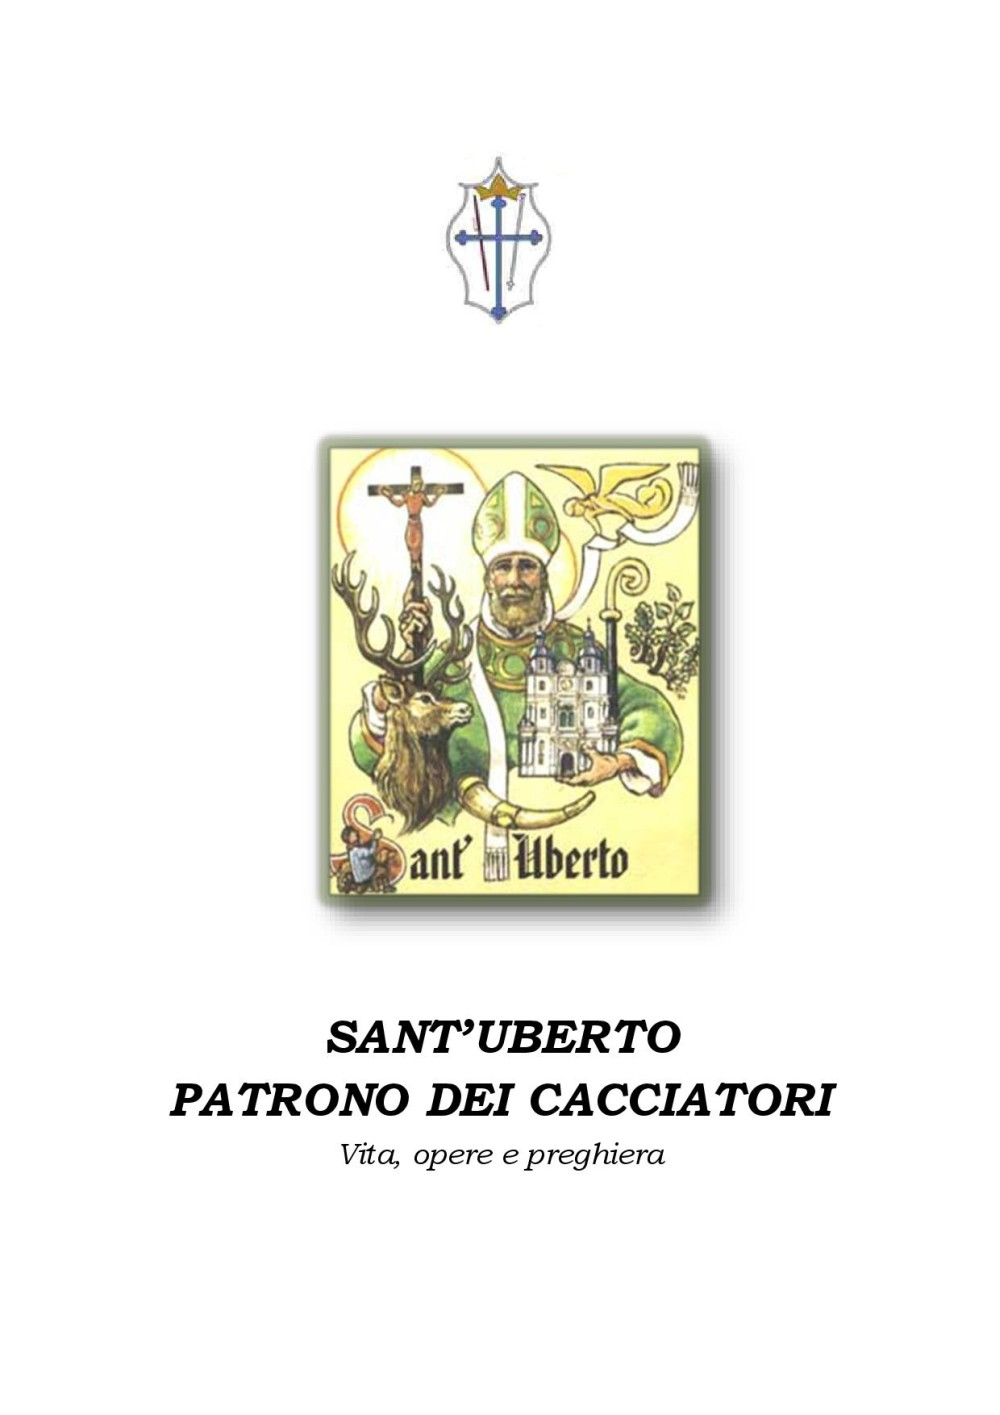 Vita di San Uberto, pagina 1